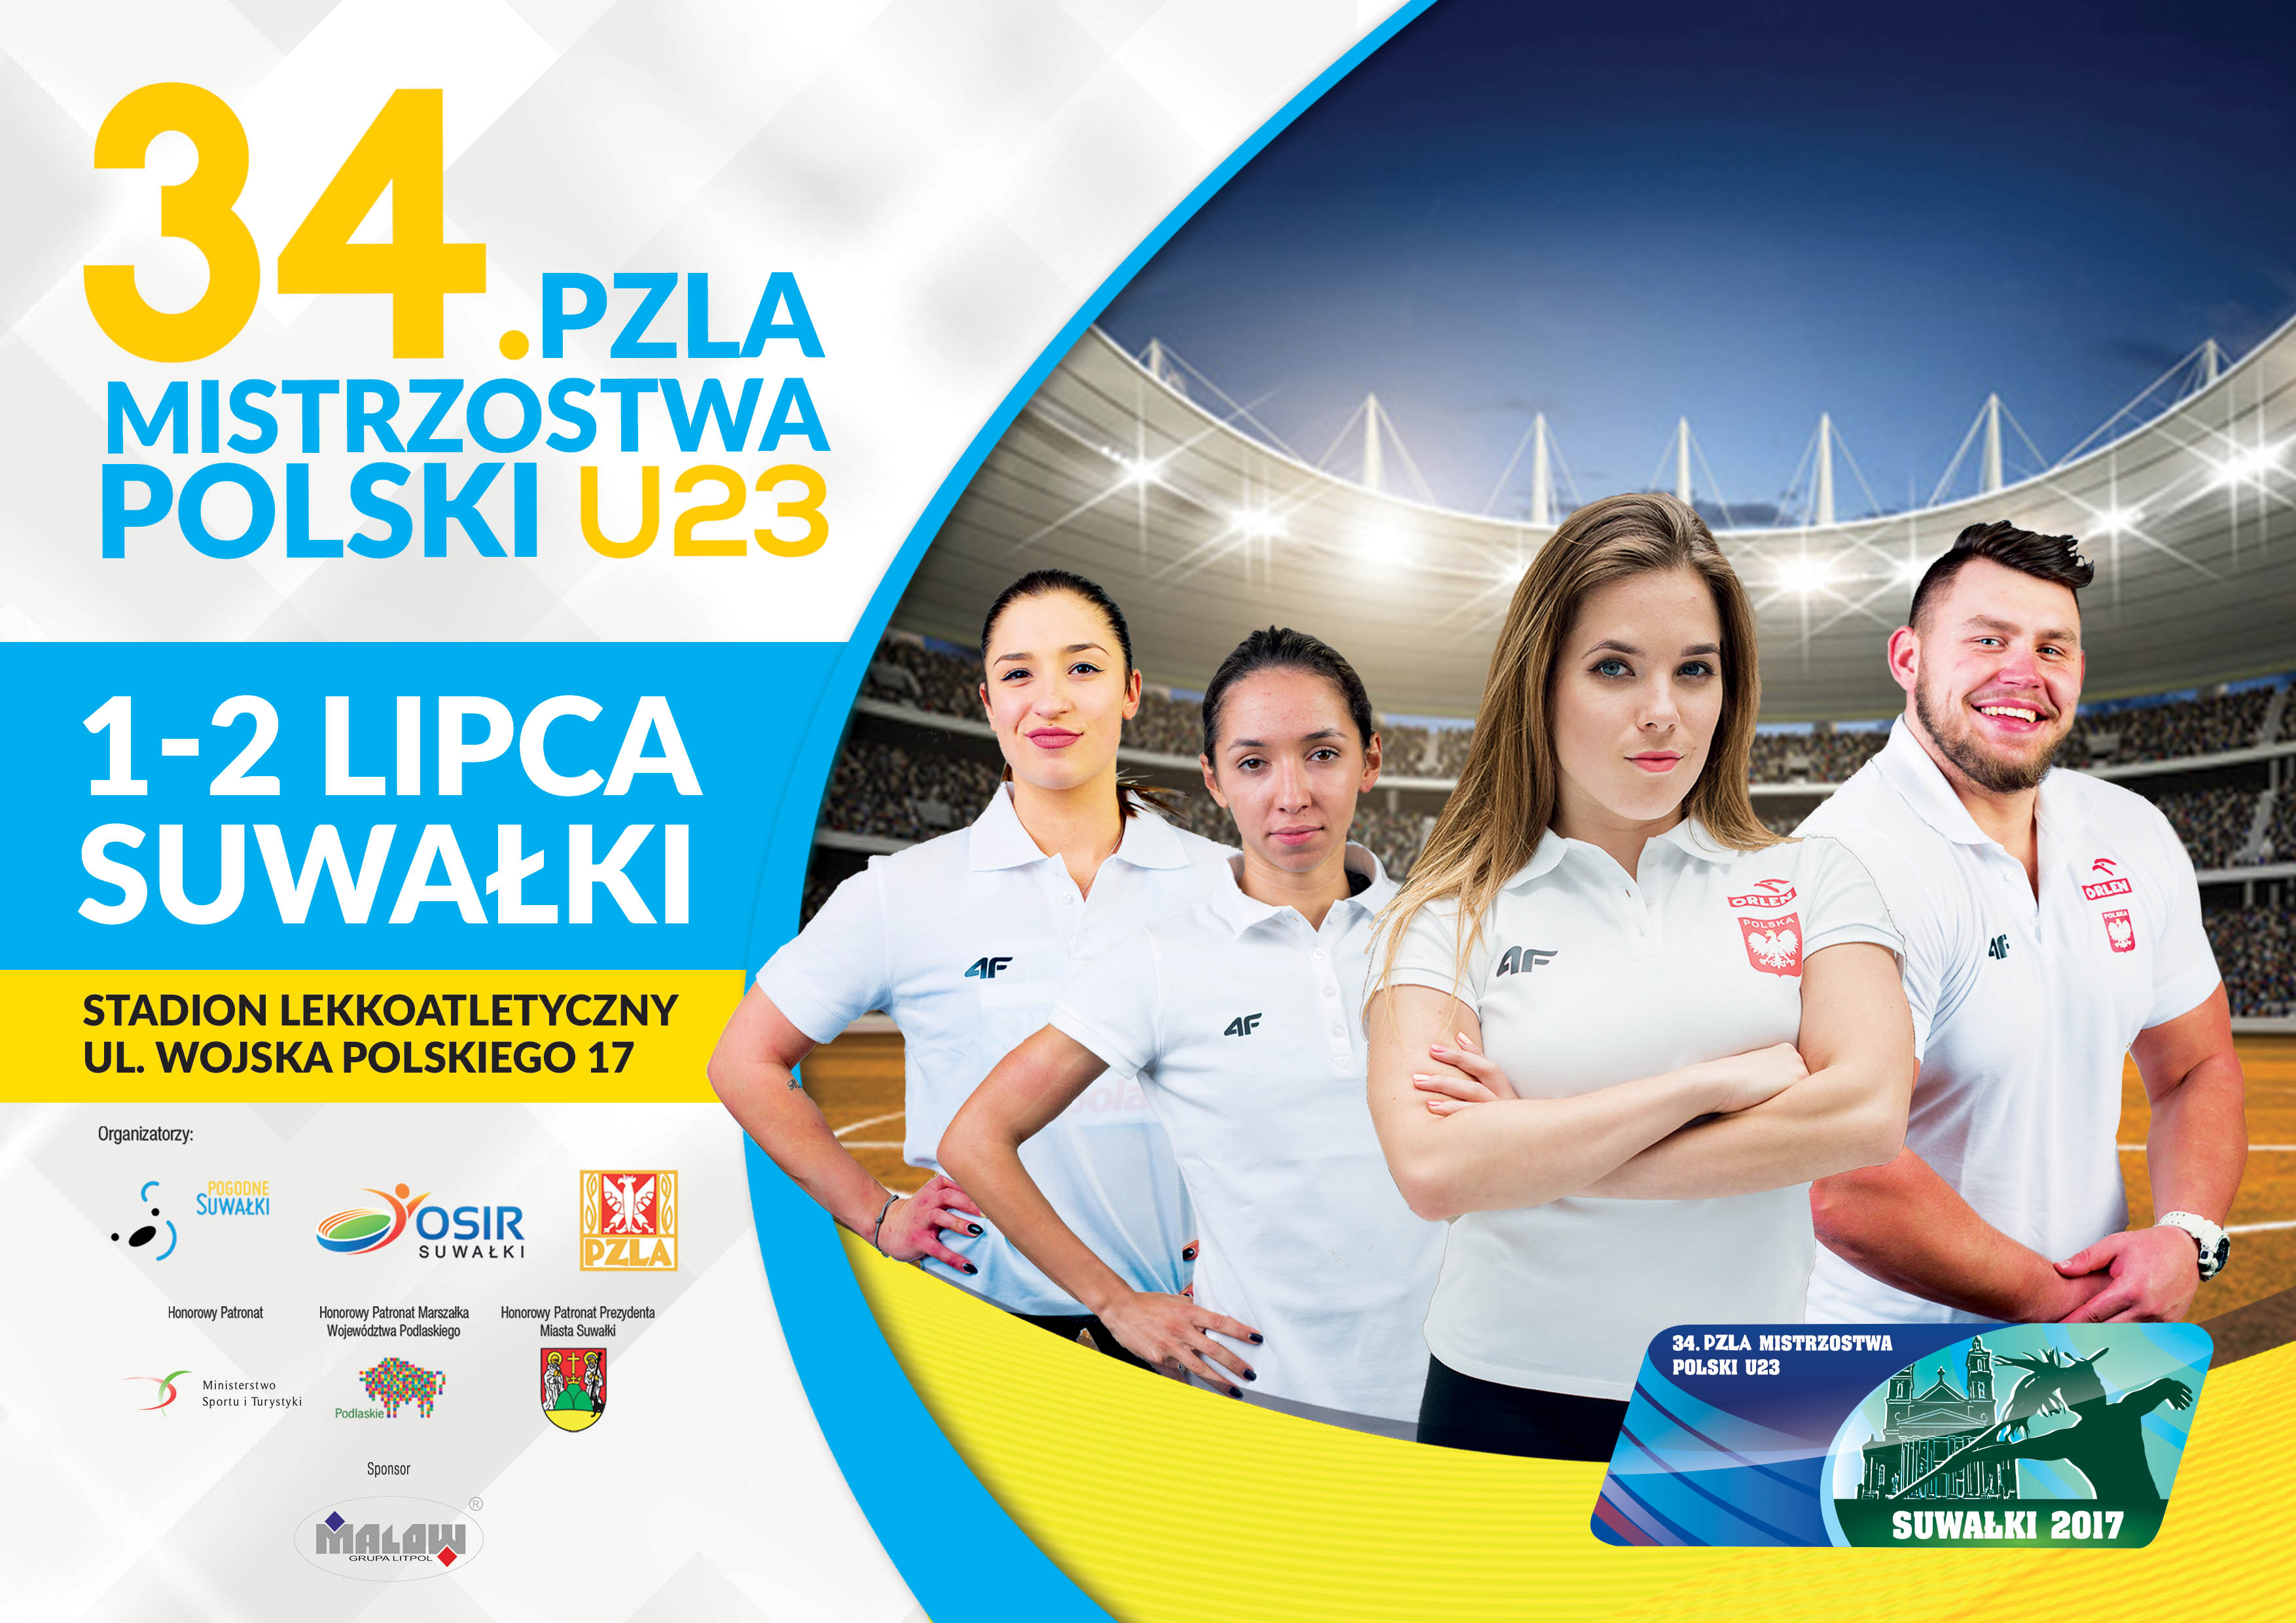 34. PZLA Mistrzostwa Polski U23